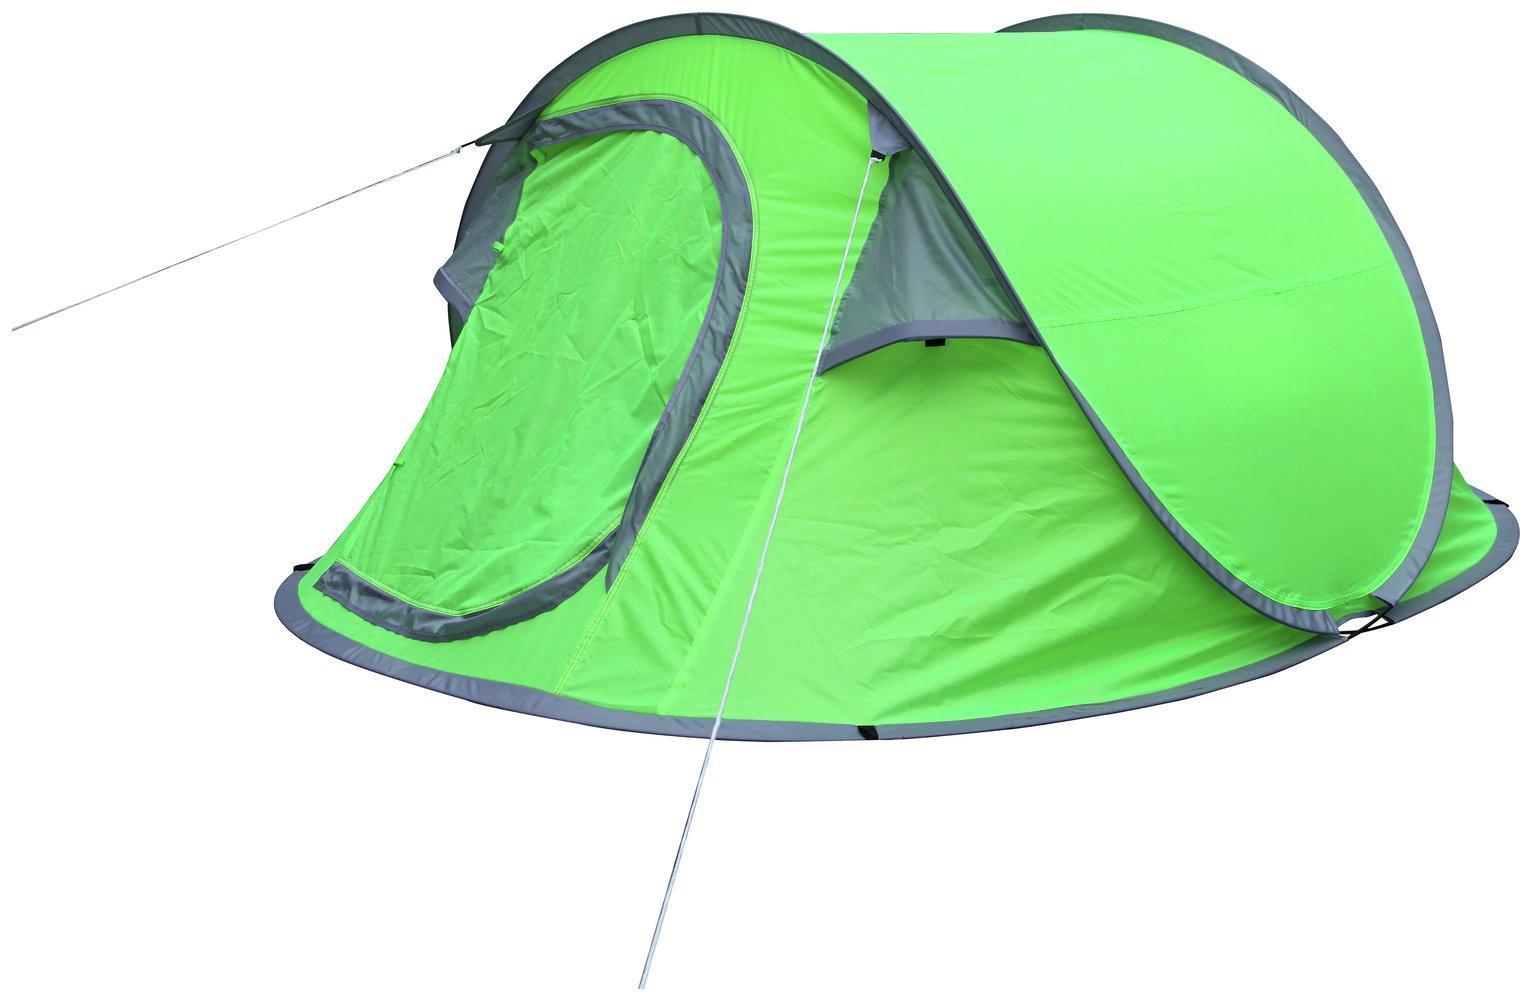 3 Man 1 Room Pop Up Tent798/8709  sc 1 st  Argos & Buy 3 Man 1 Room Pop Up Tent | Tents | Argos